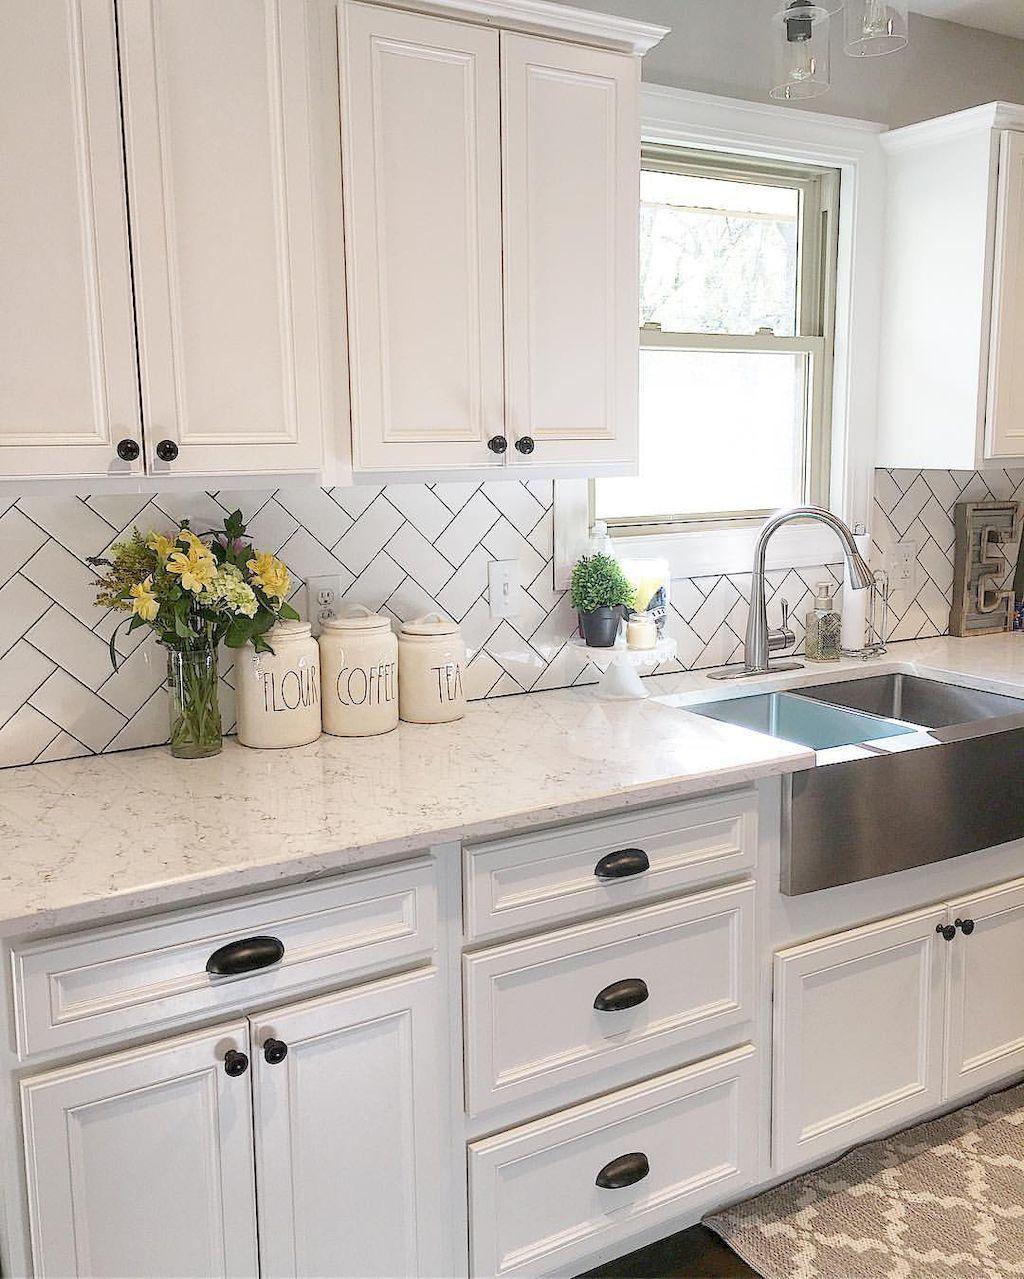 75 Stunning Kitchen Backsplash Decorating Ideas | Kitchens, Kitchen ...